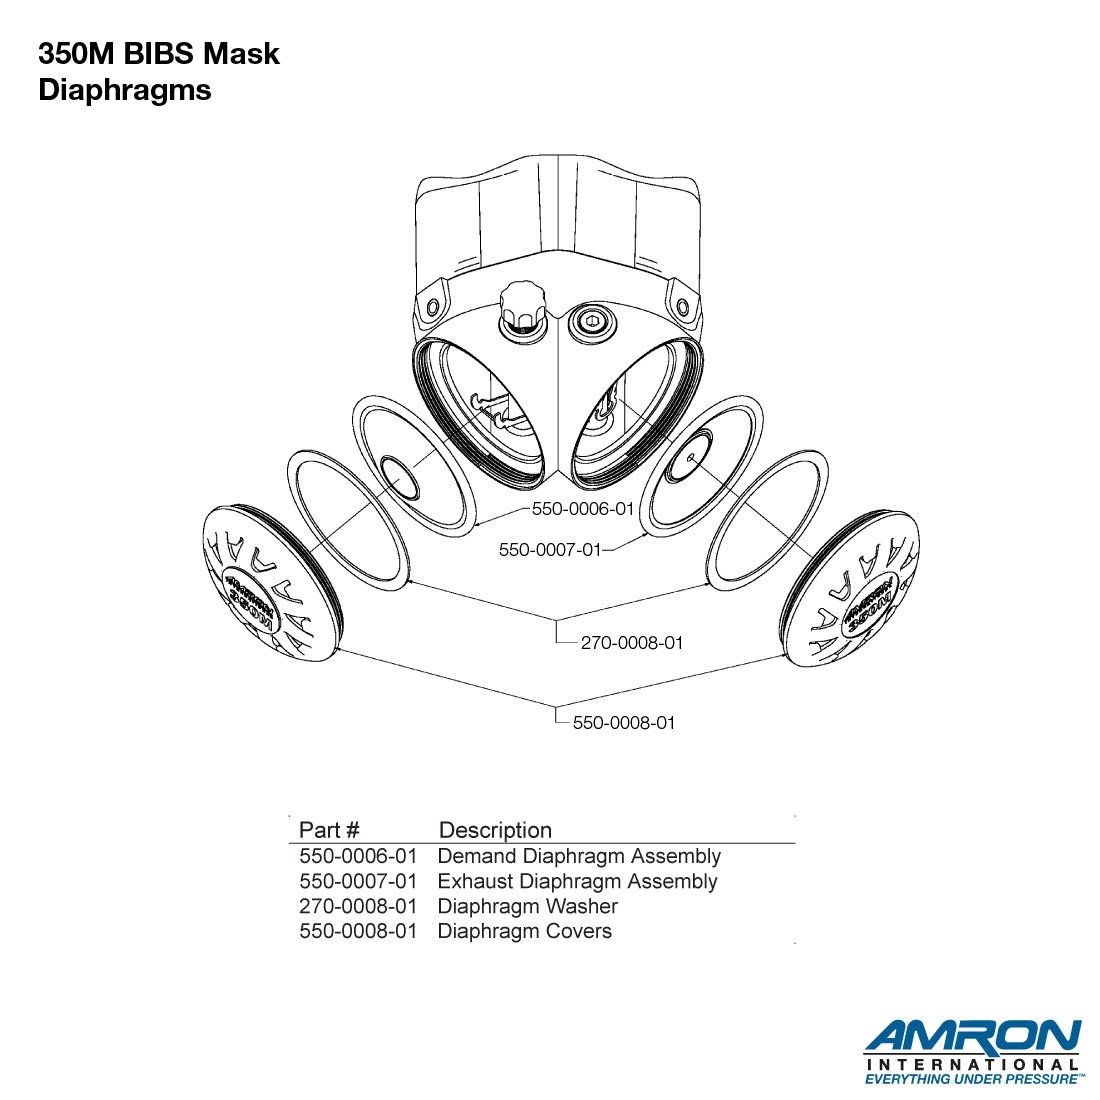 Amron International 350M BIBS - Diaphragms Breakout